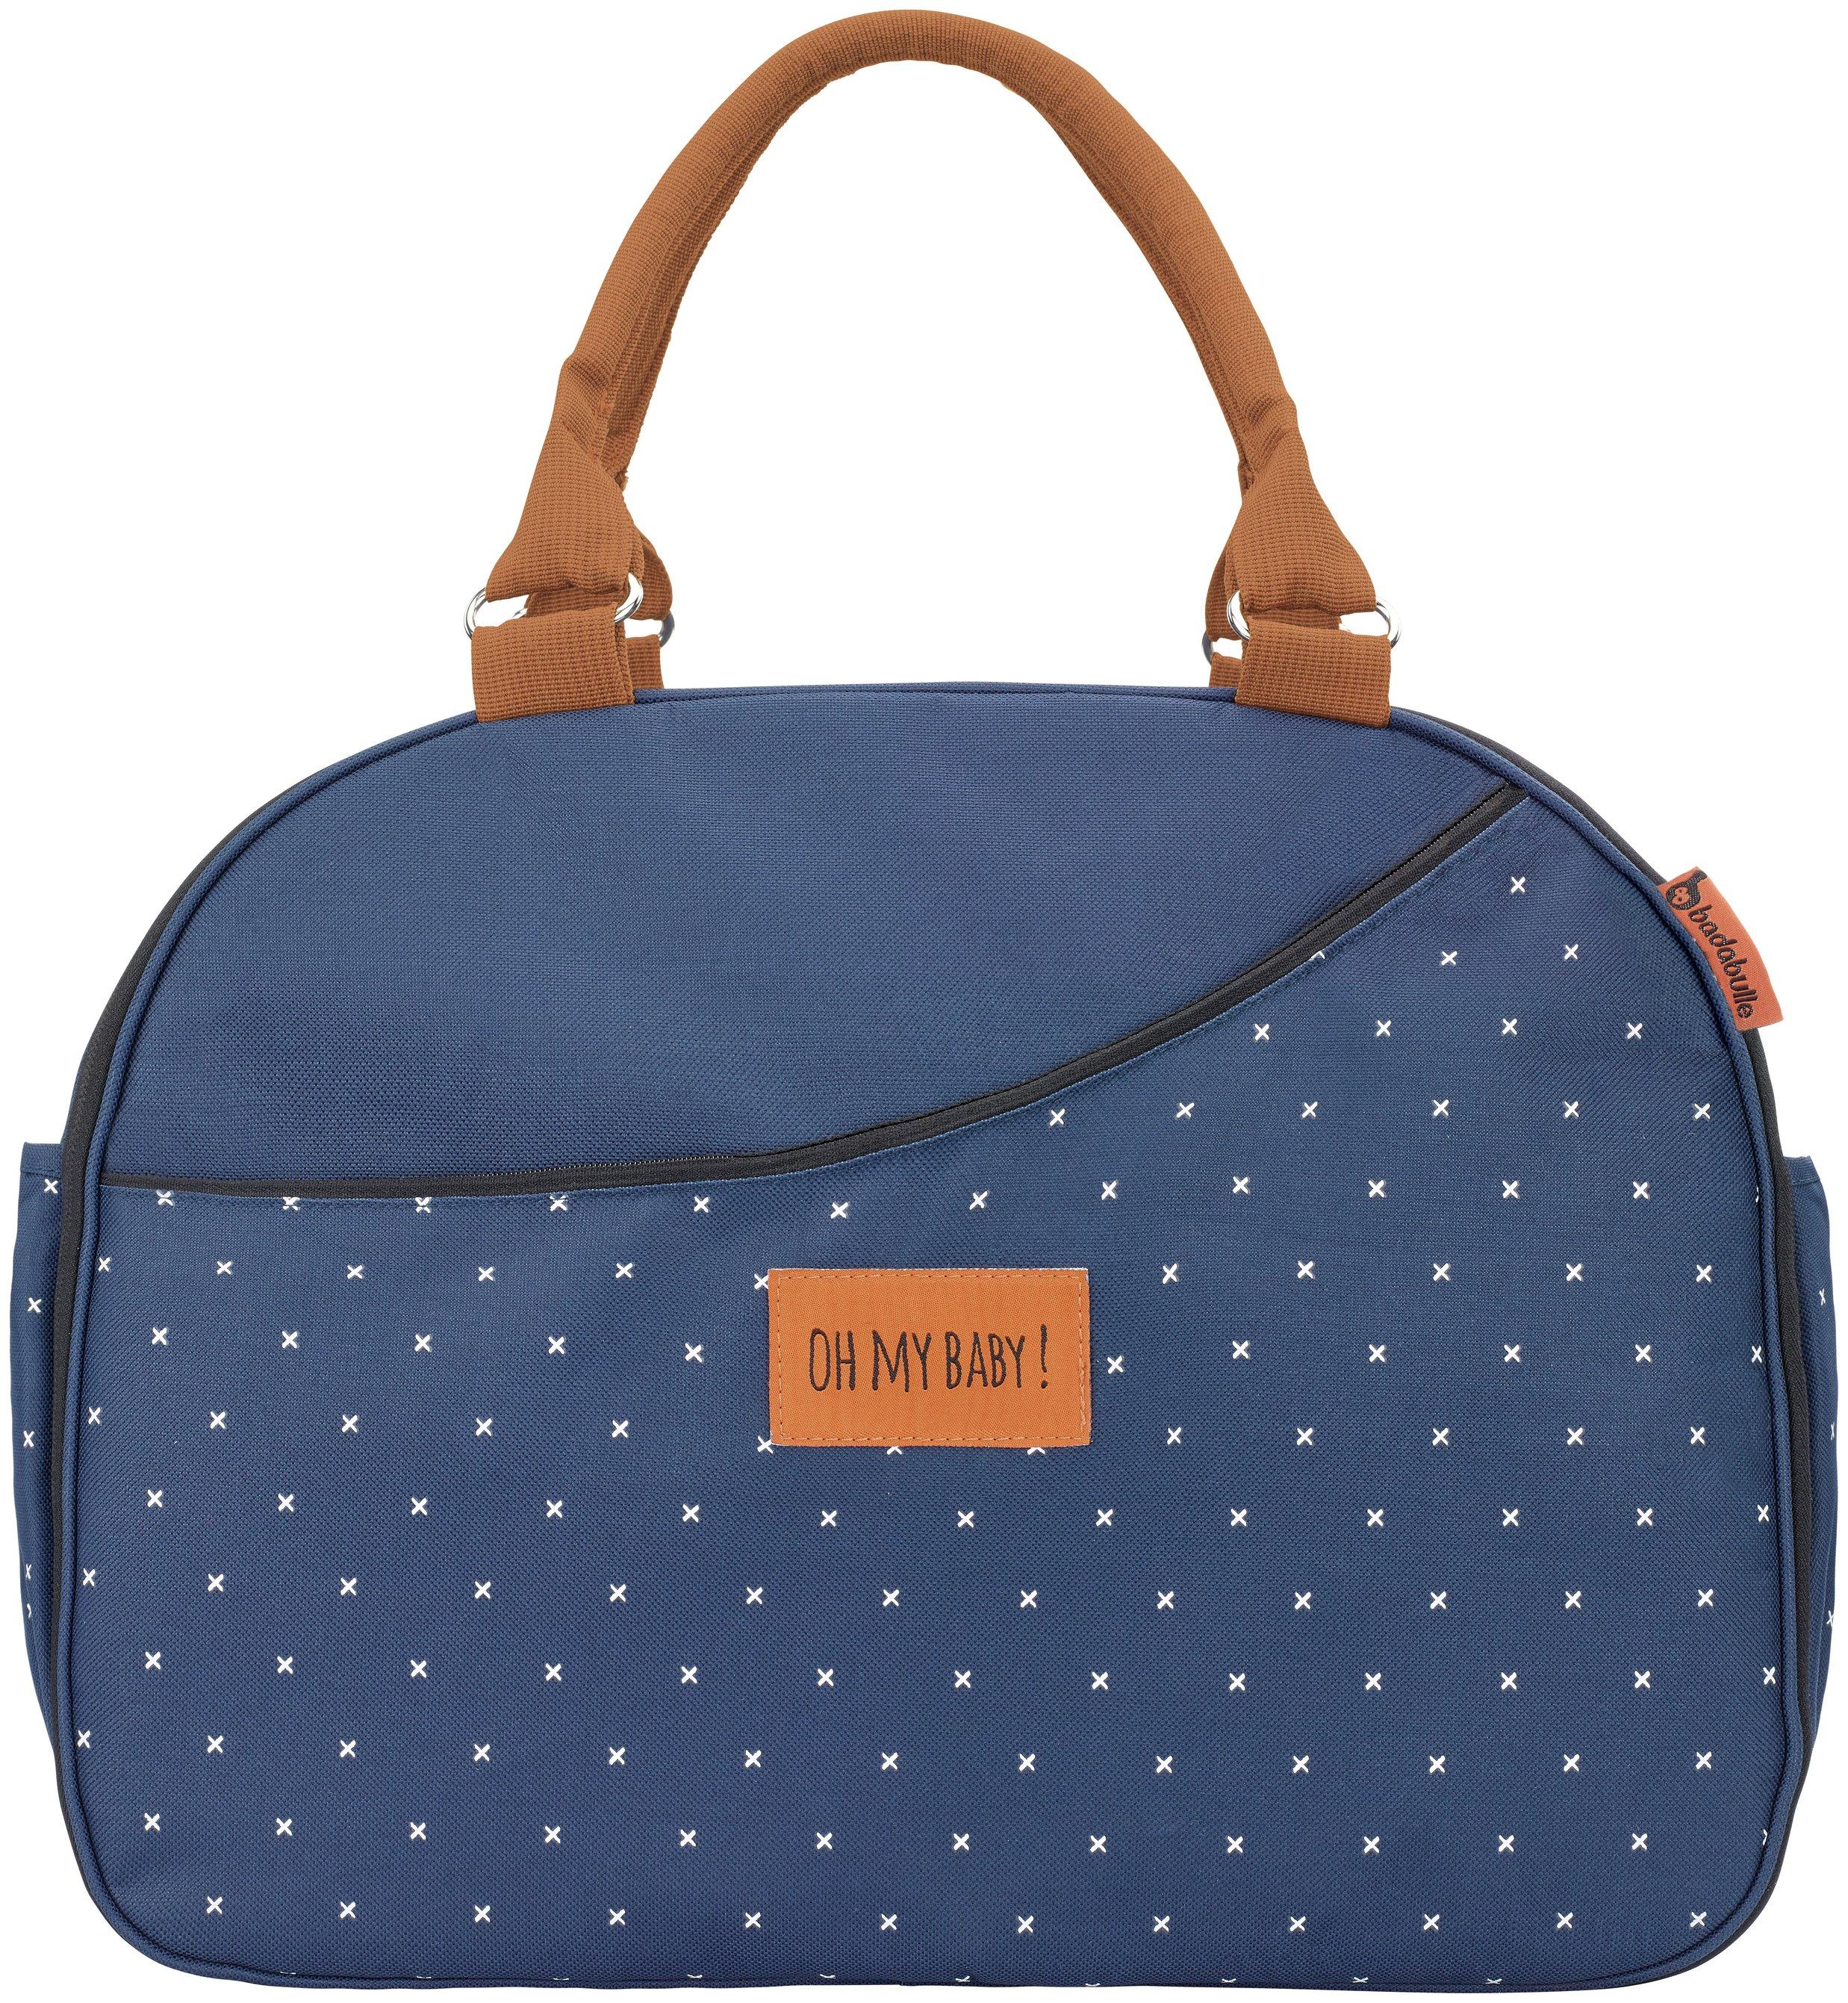 Badabulle Weekend Changing Bag - Dark Blue